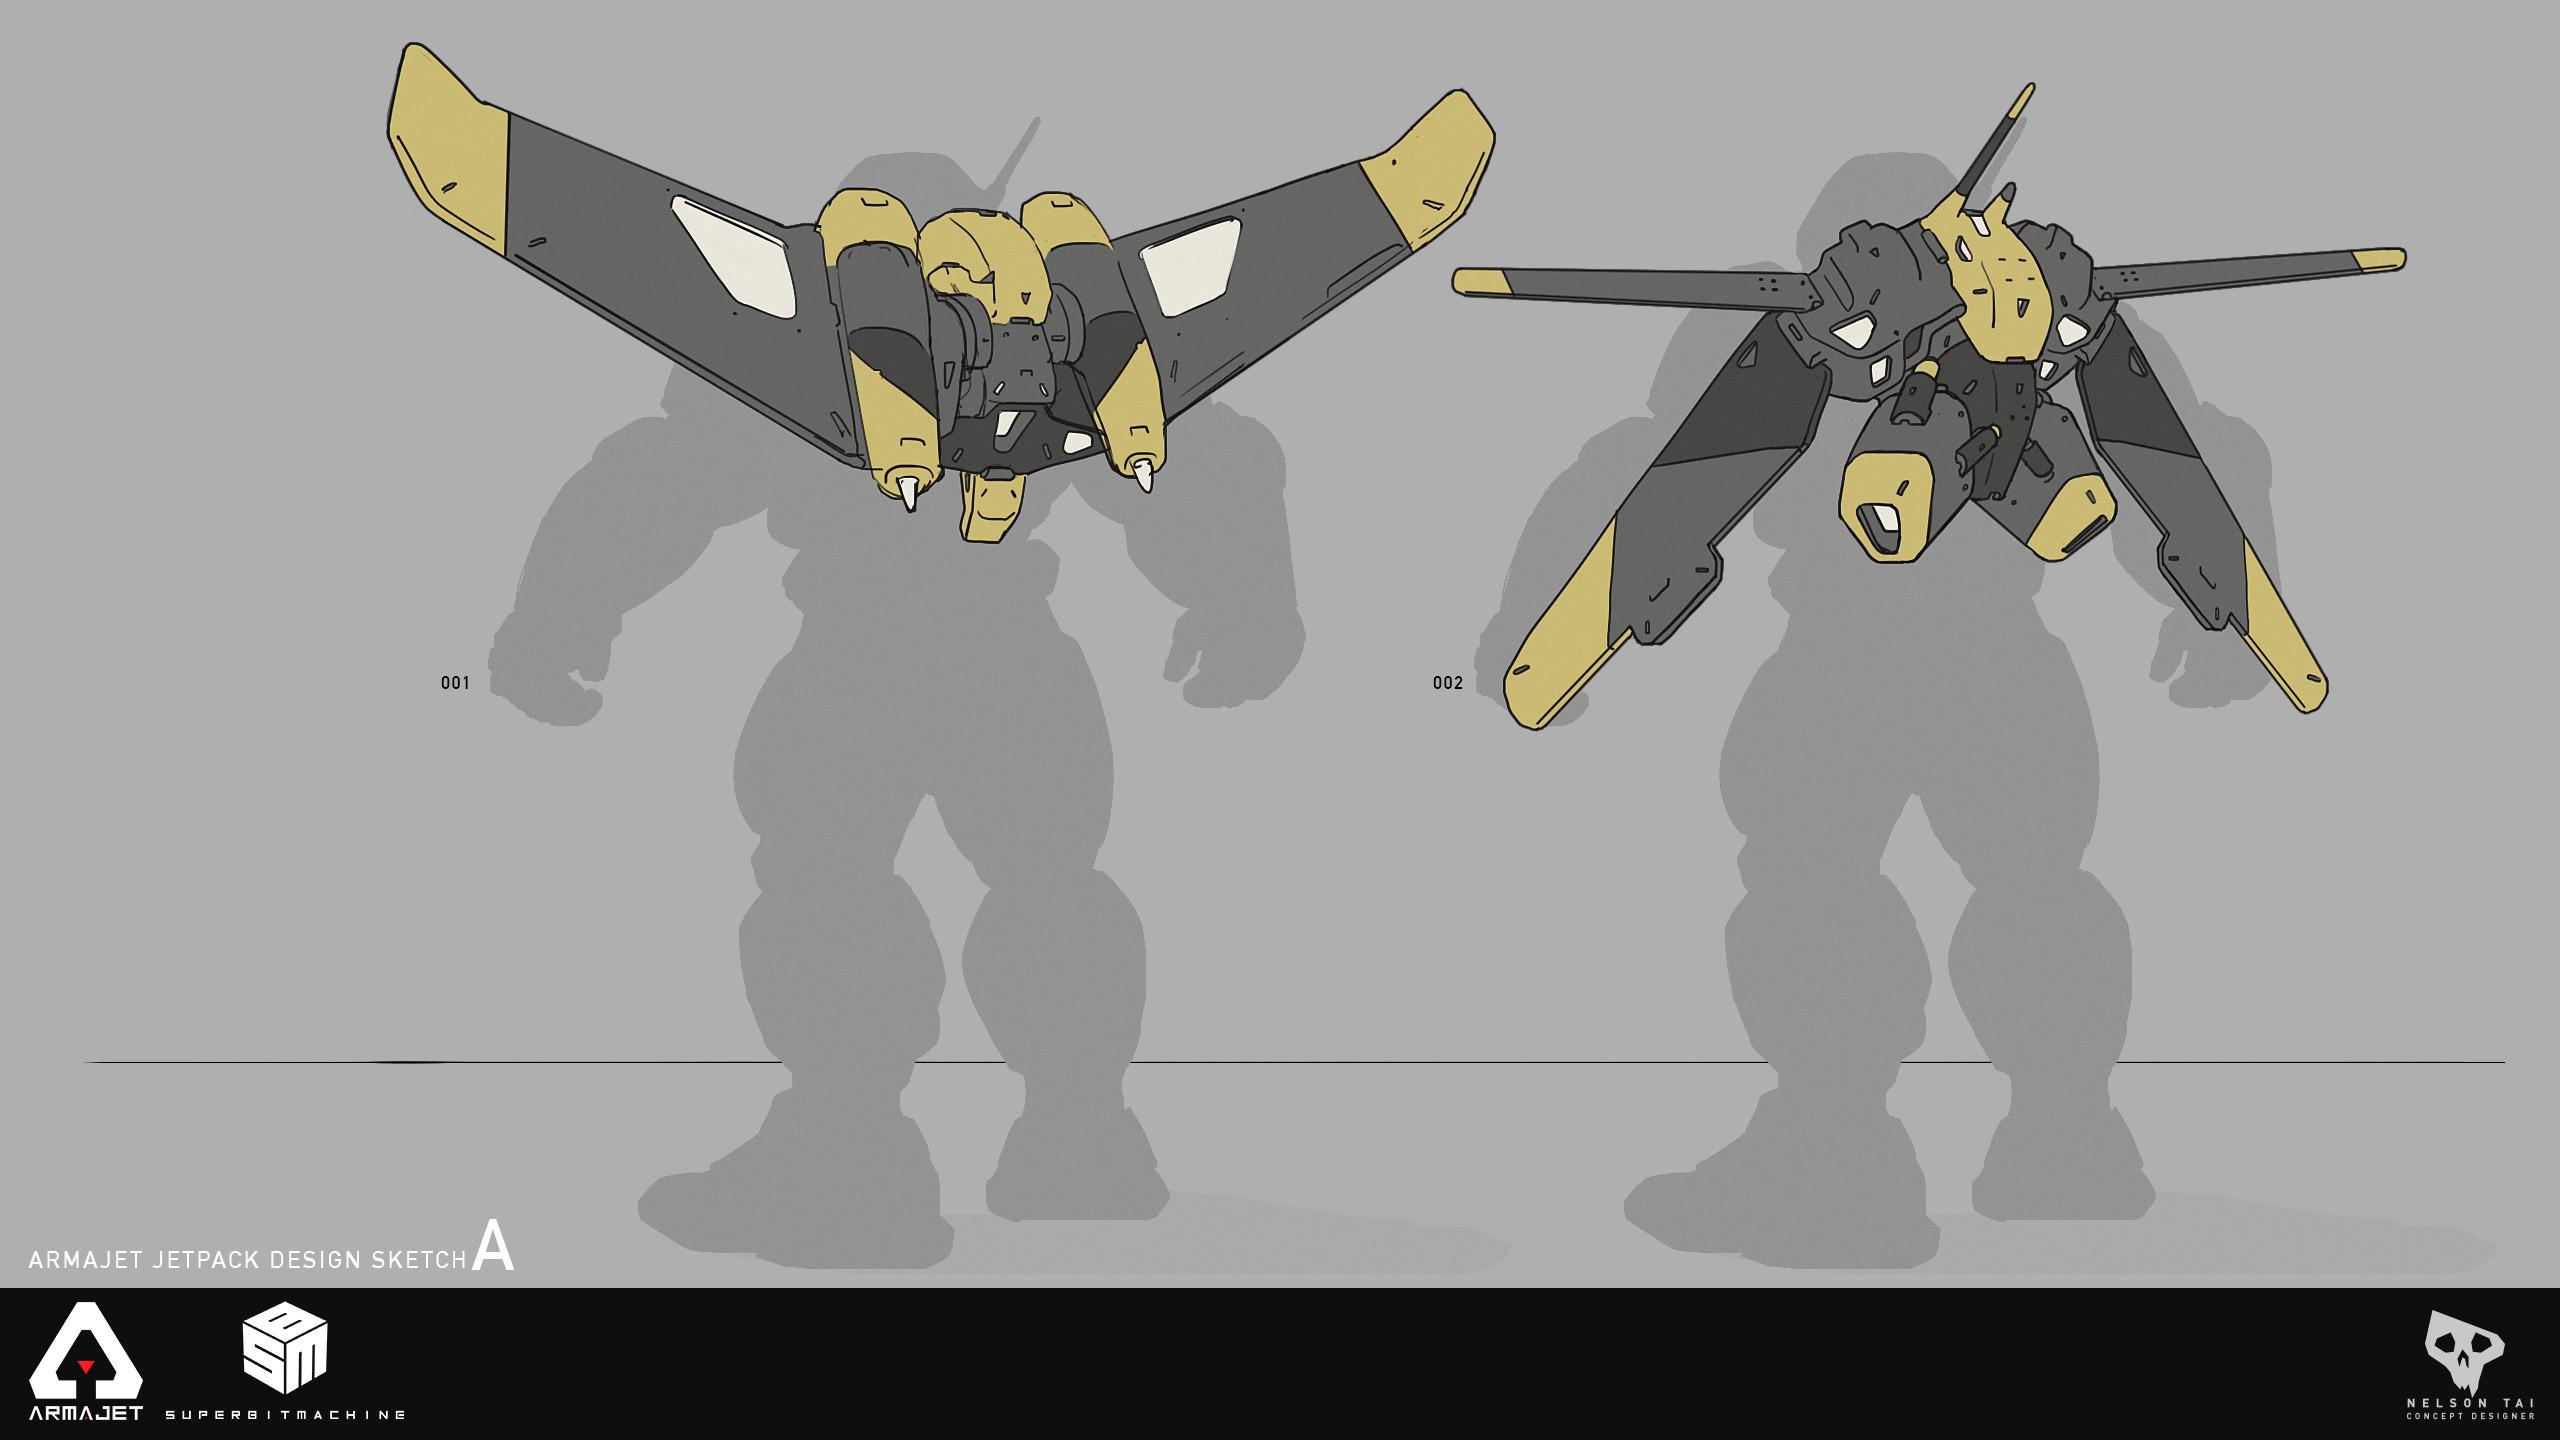 Armajet Jetpack Design A